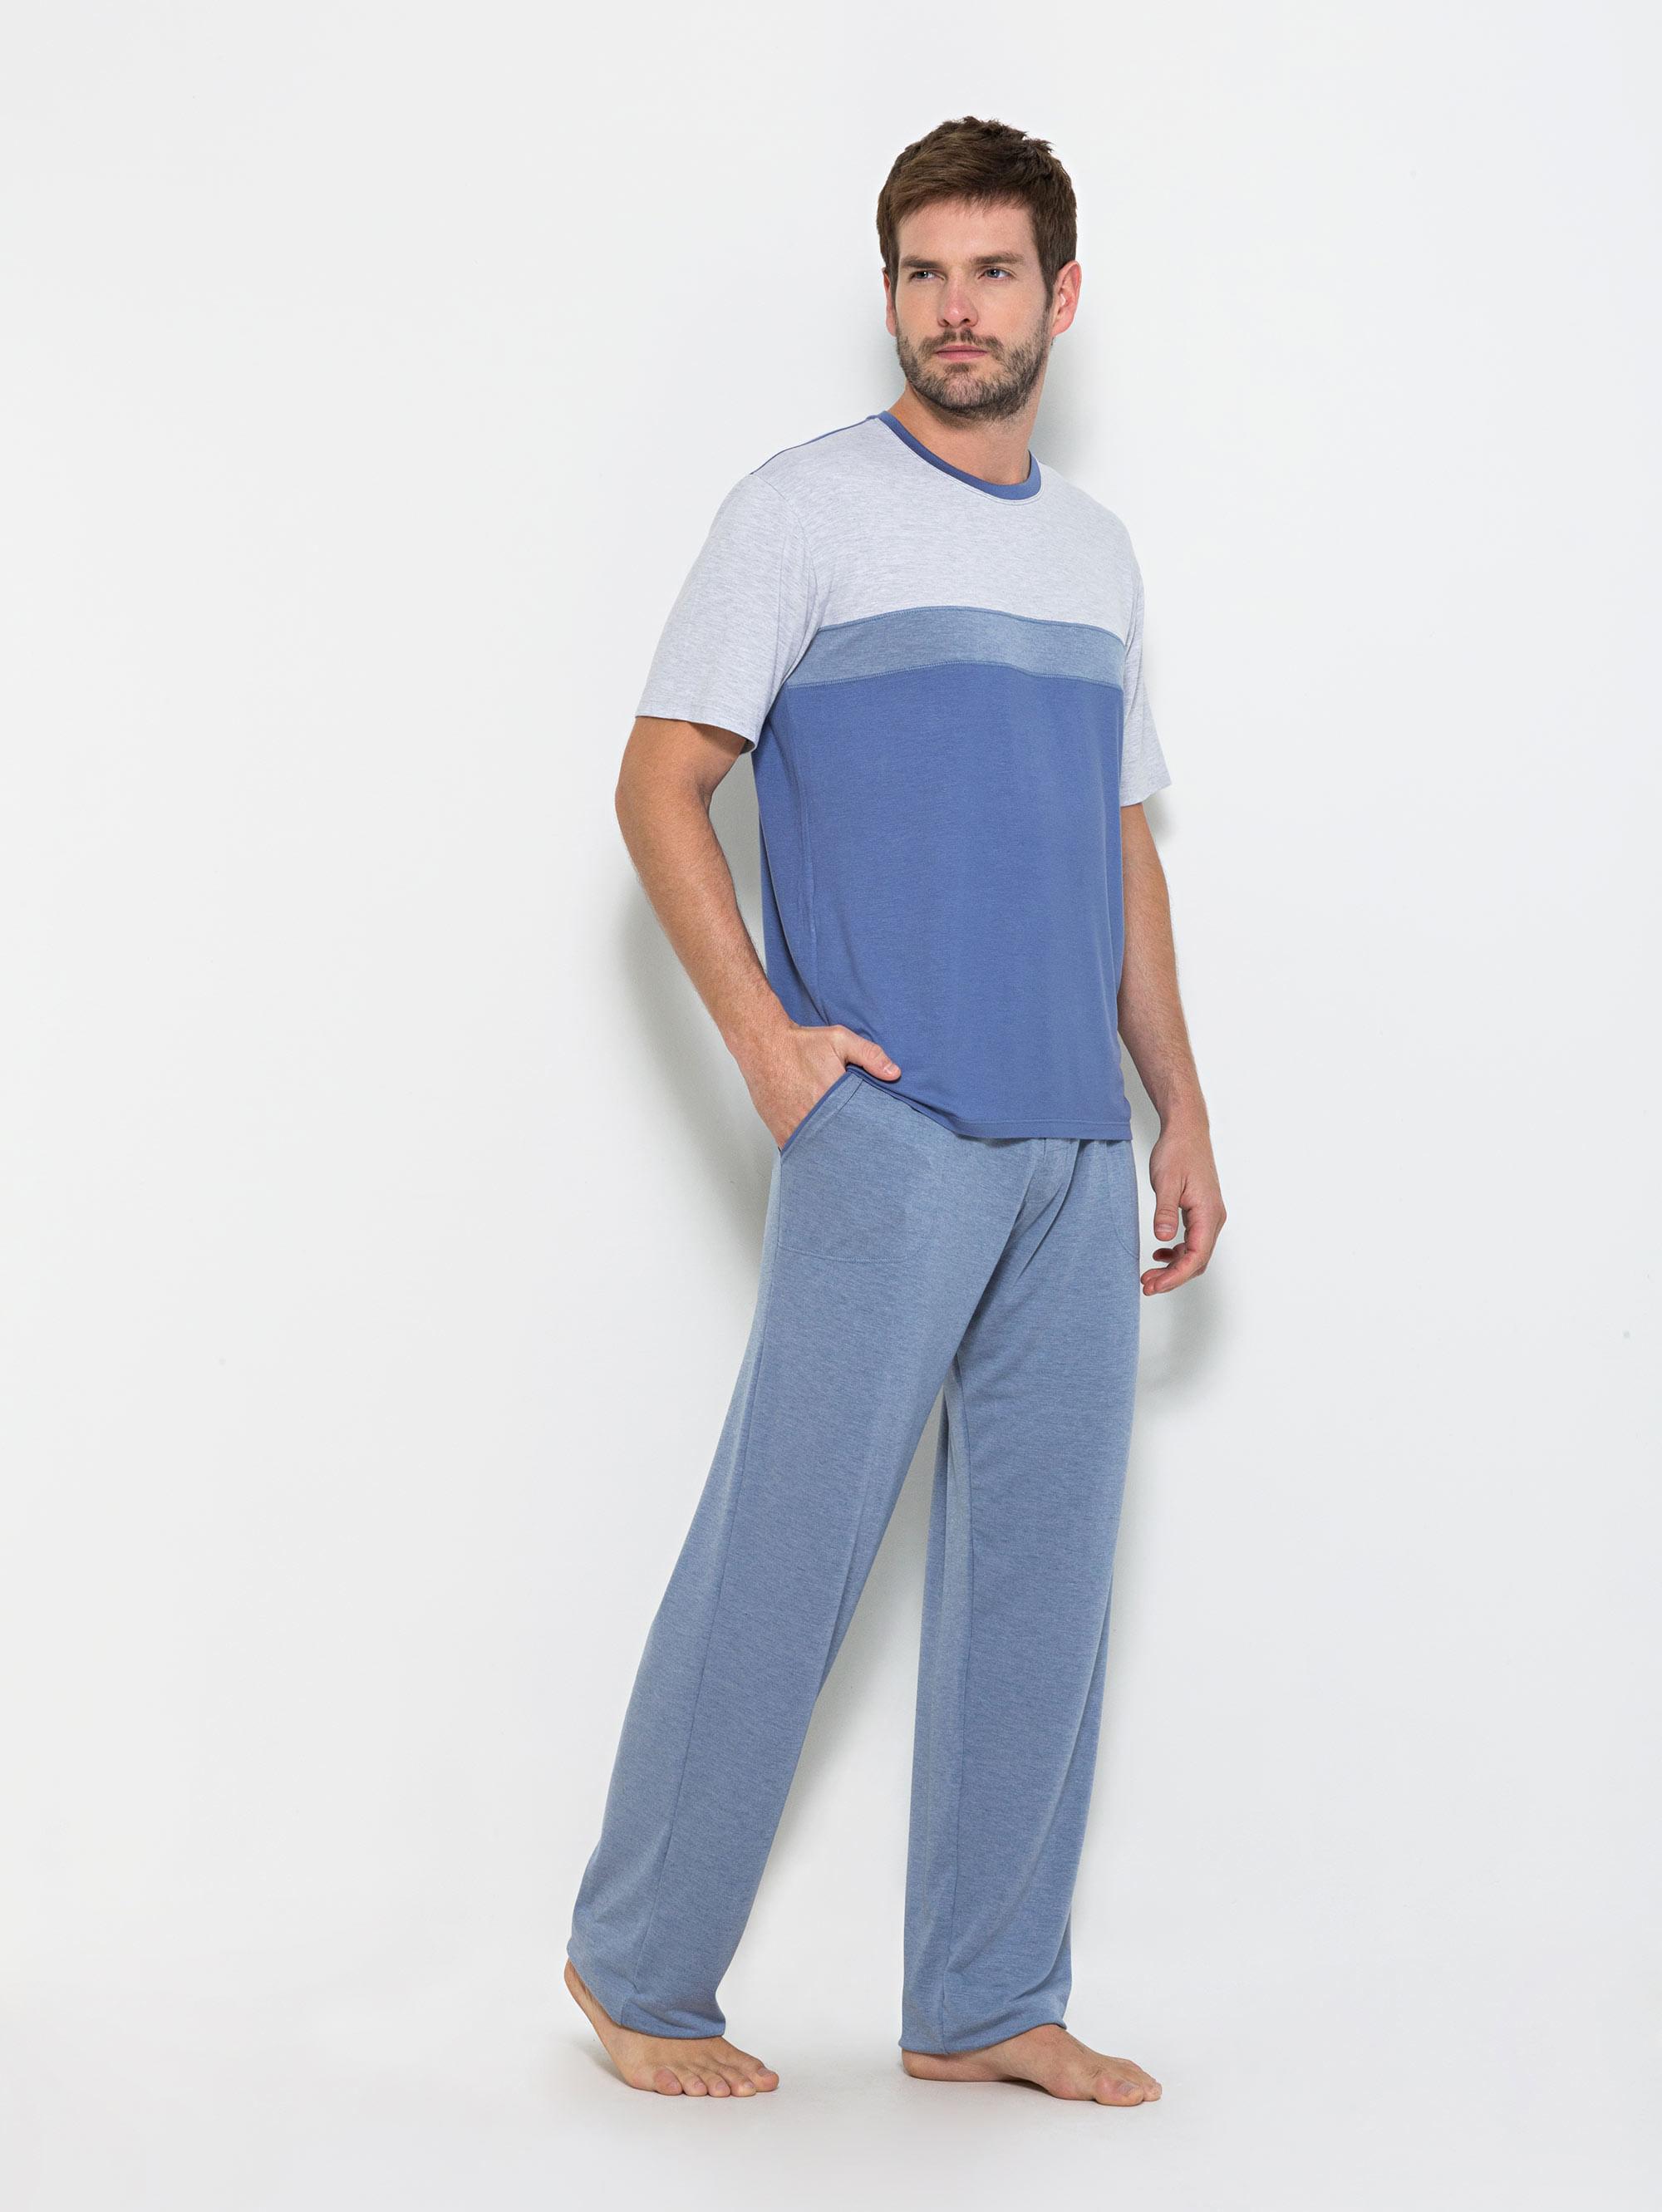 Pijama-Longo-Manga-Curta-Masculino-Zip-Ling-04.04.0506